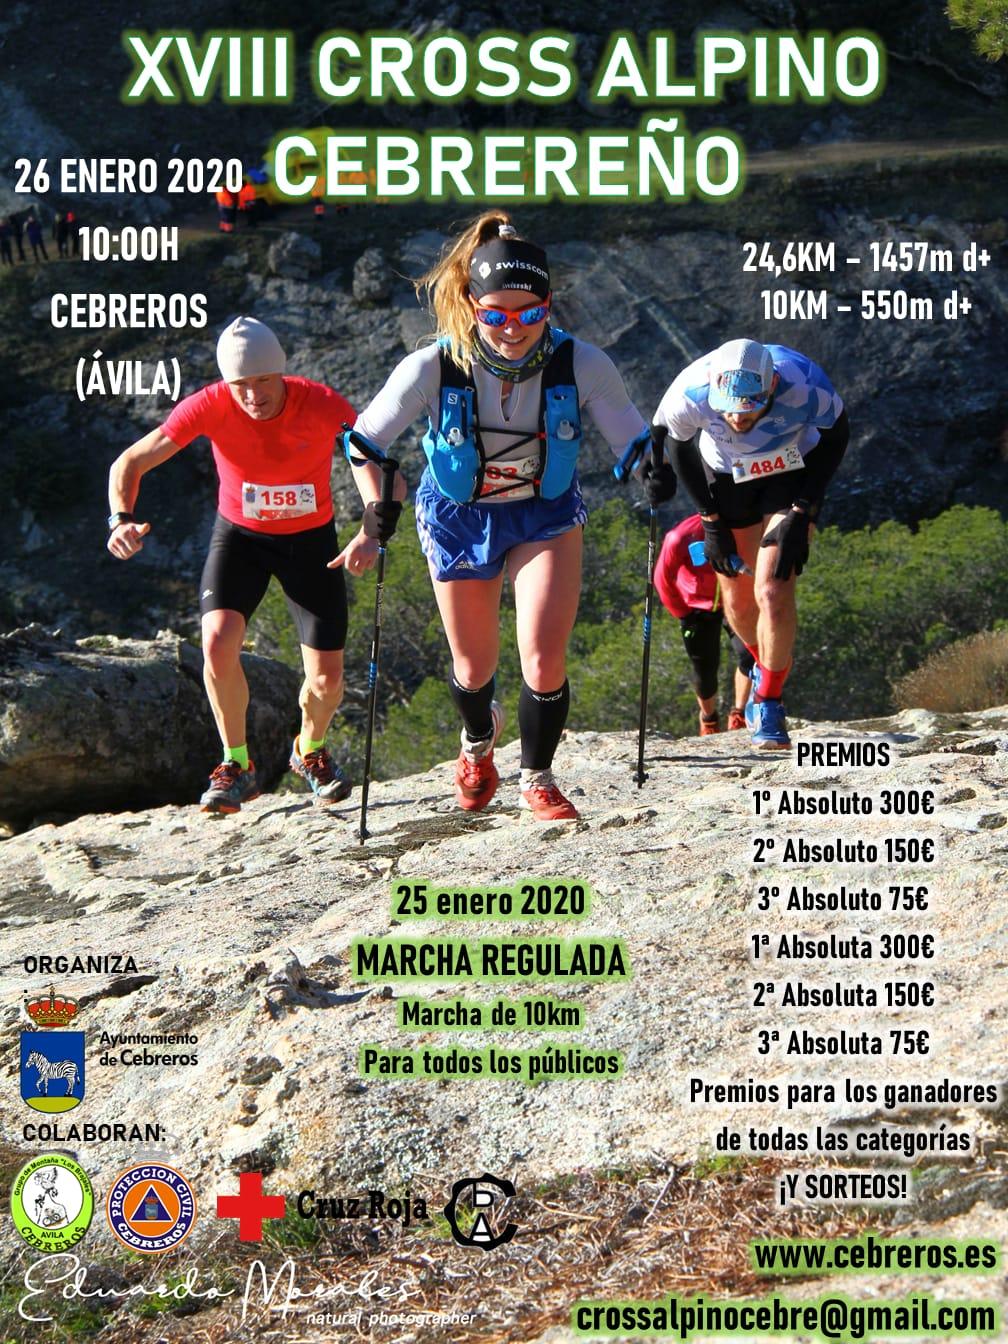 10Km. XVIII Cross Alpino Cebrereño